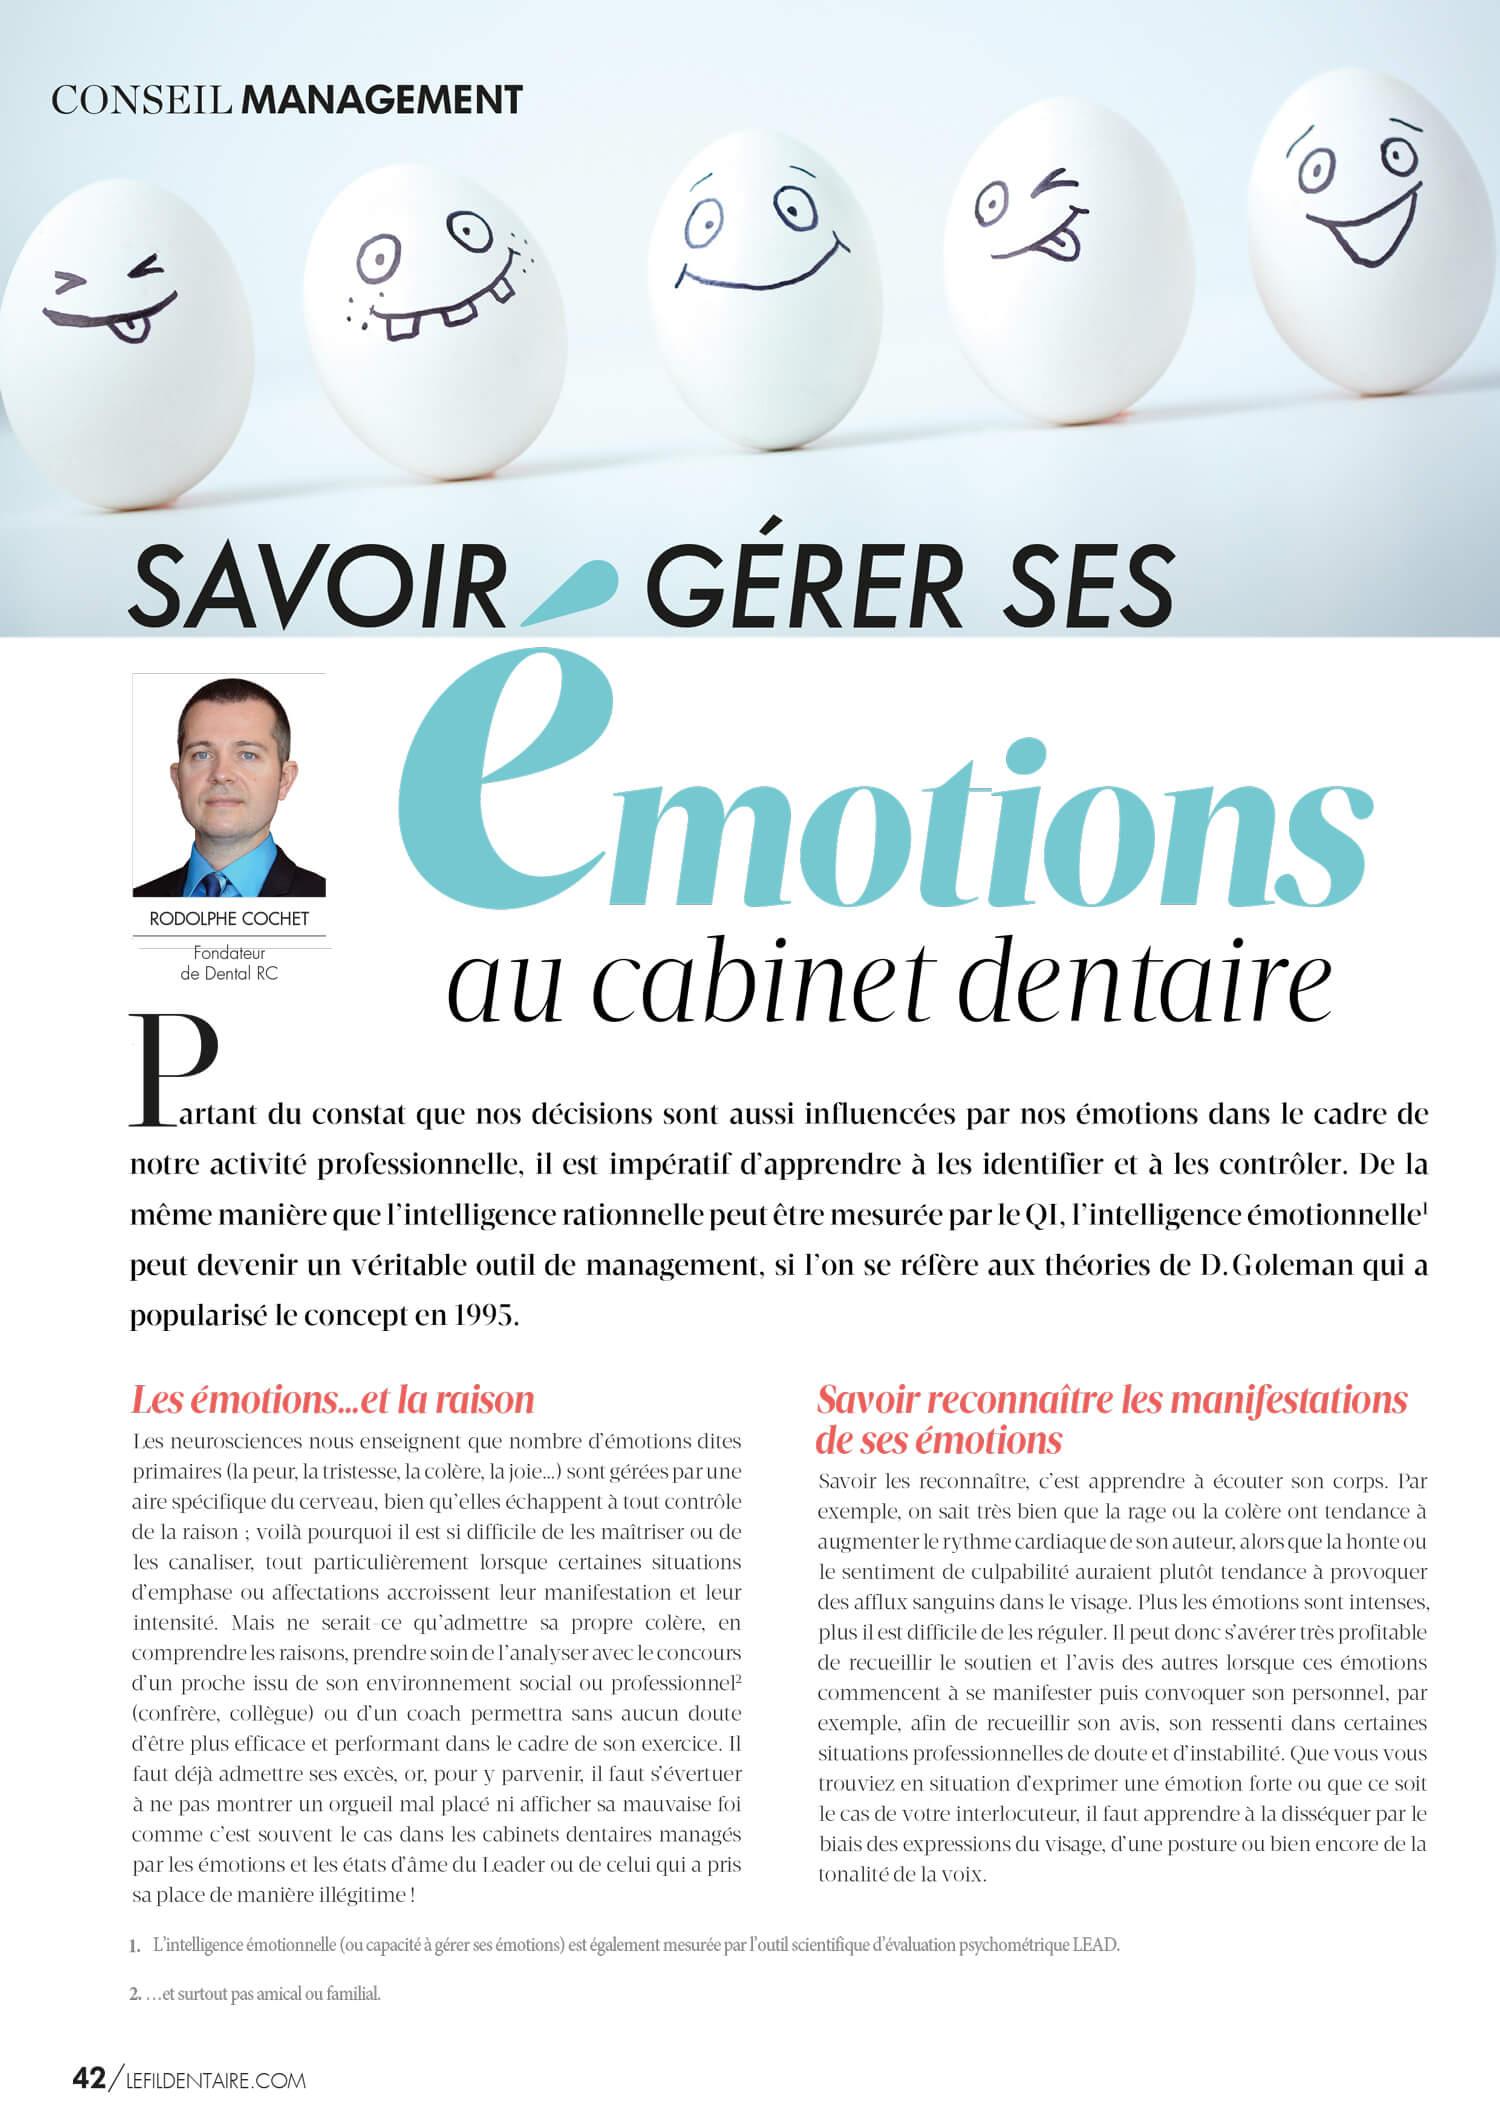 Savoir_gerer_ses_emotions_au_cabinet_dentaire_-_Rodolphe_Cochet.jpg